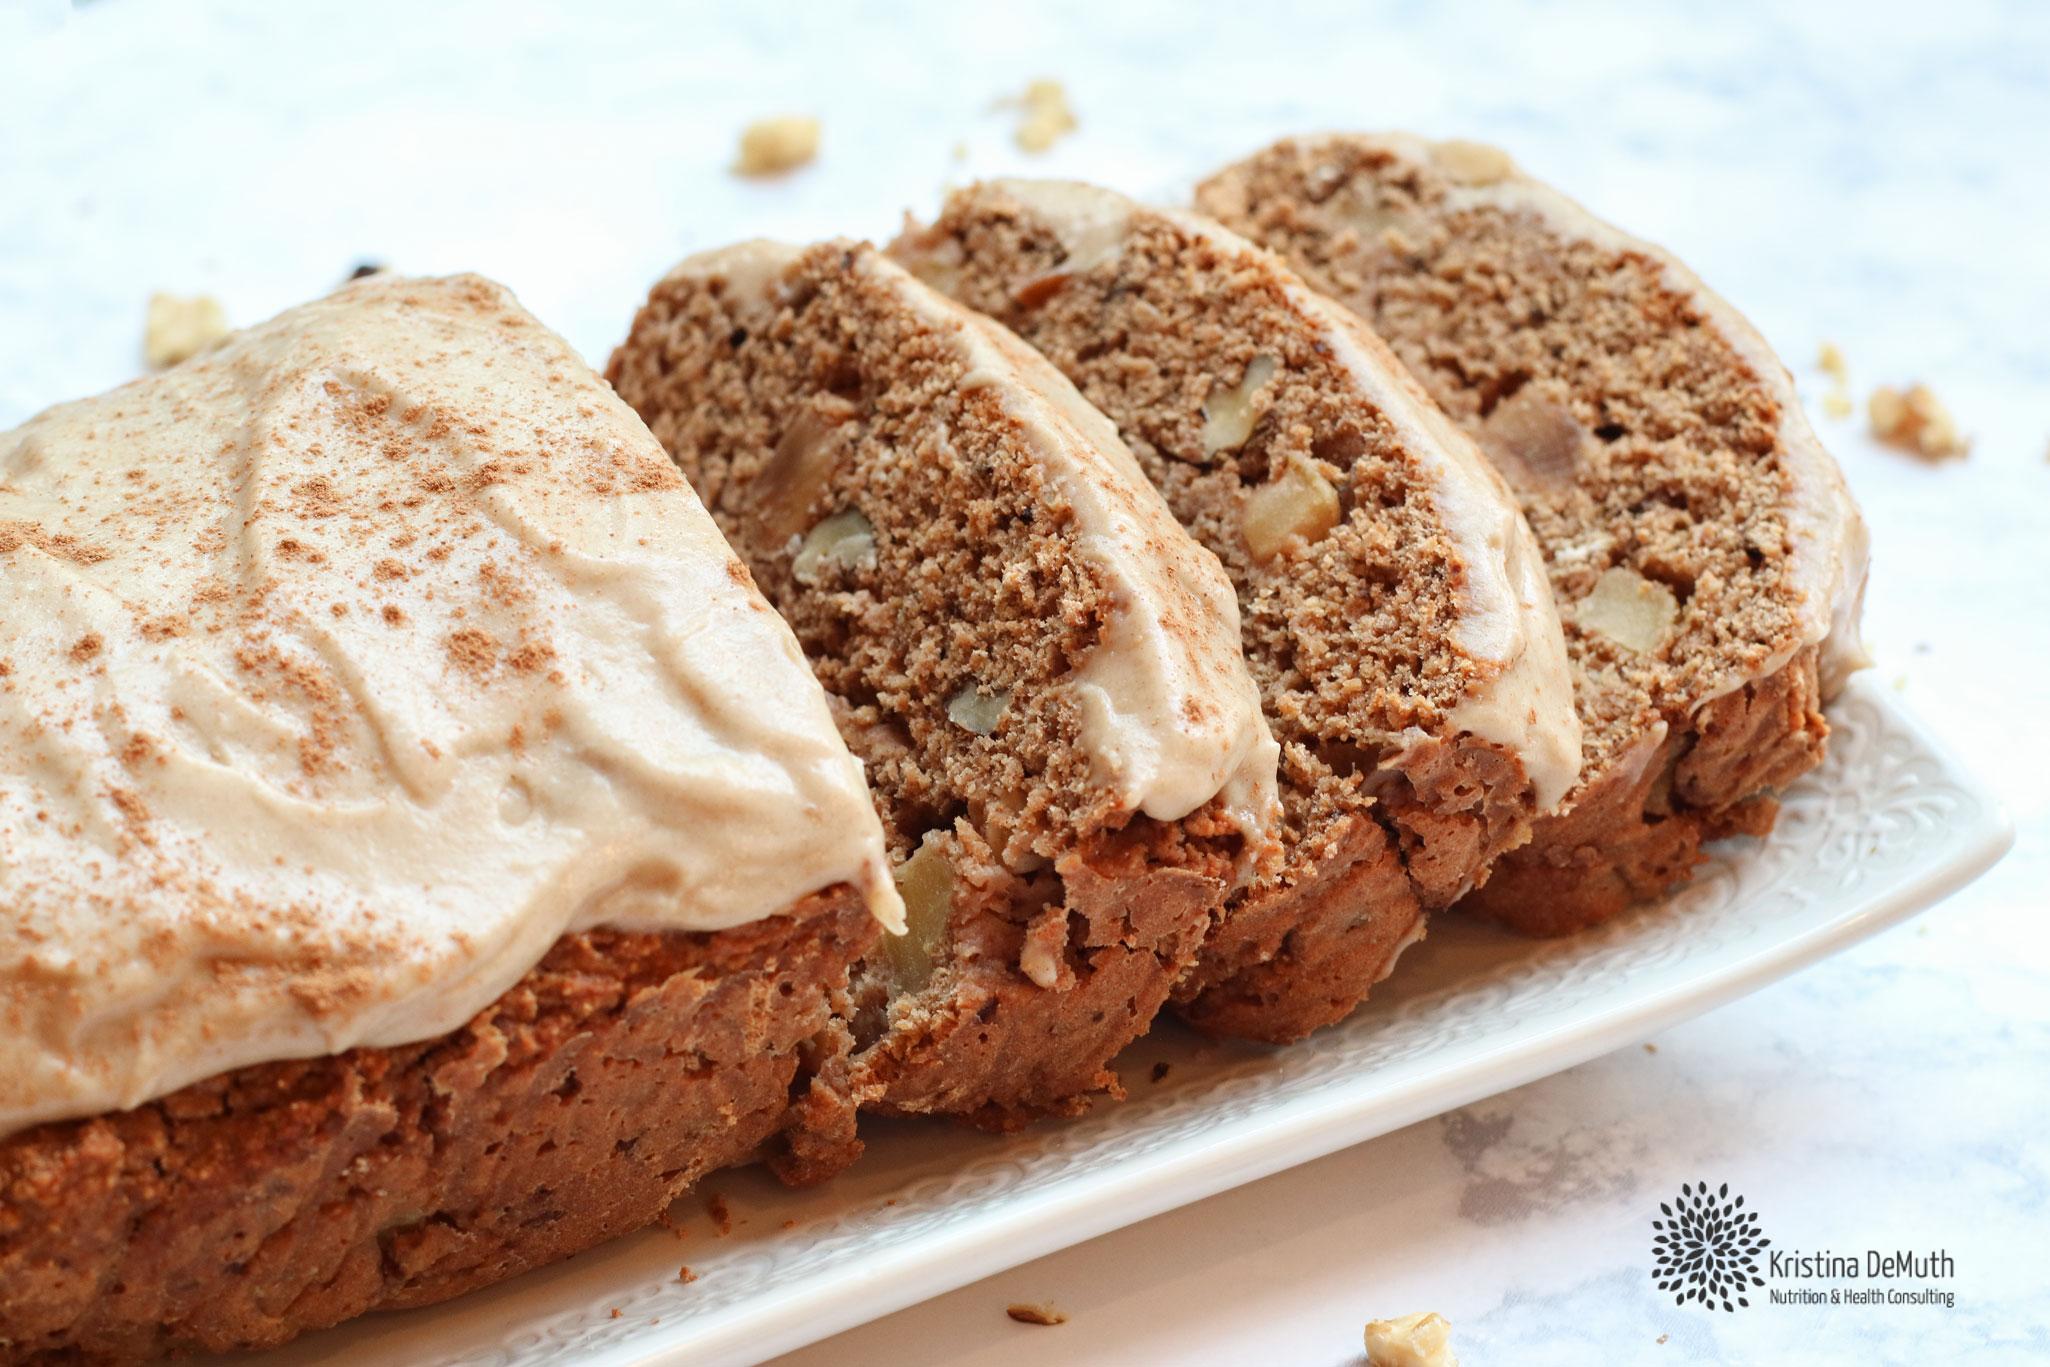 Vegan Cinnamon Apple Walnut Bread